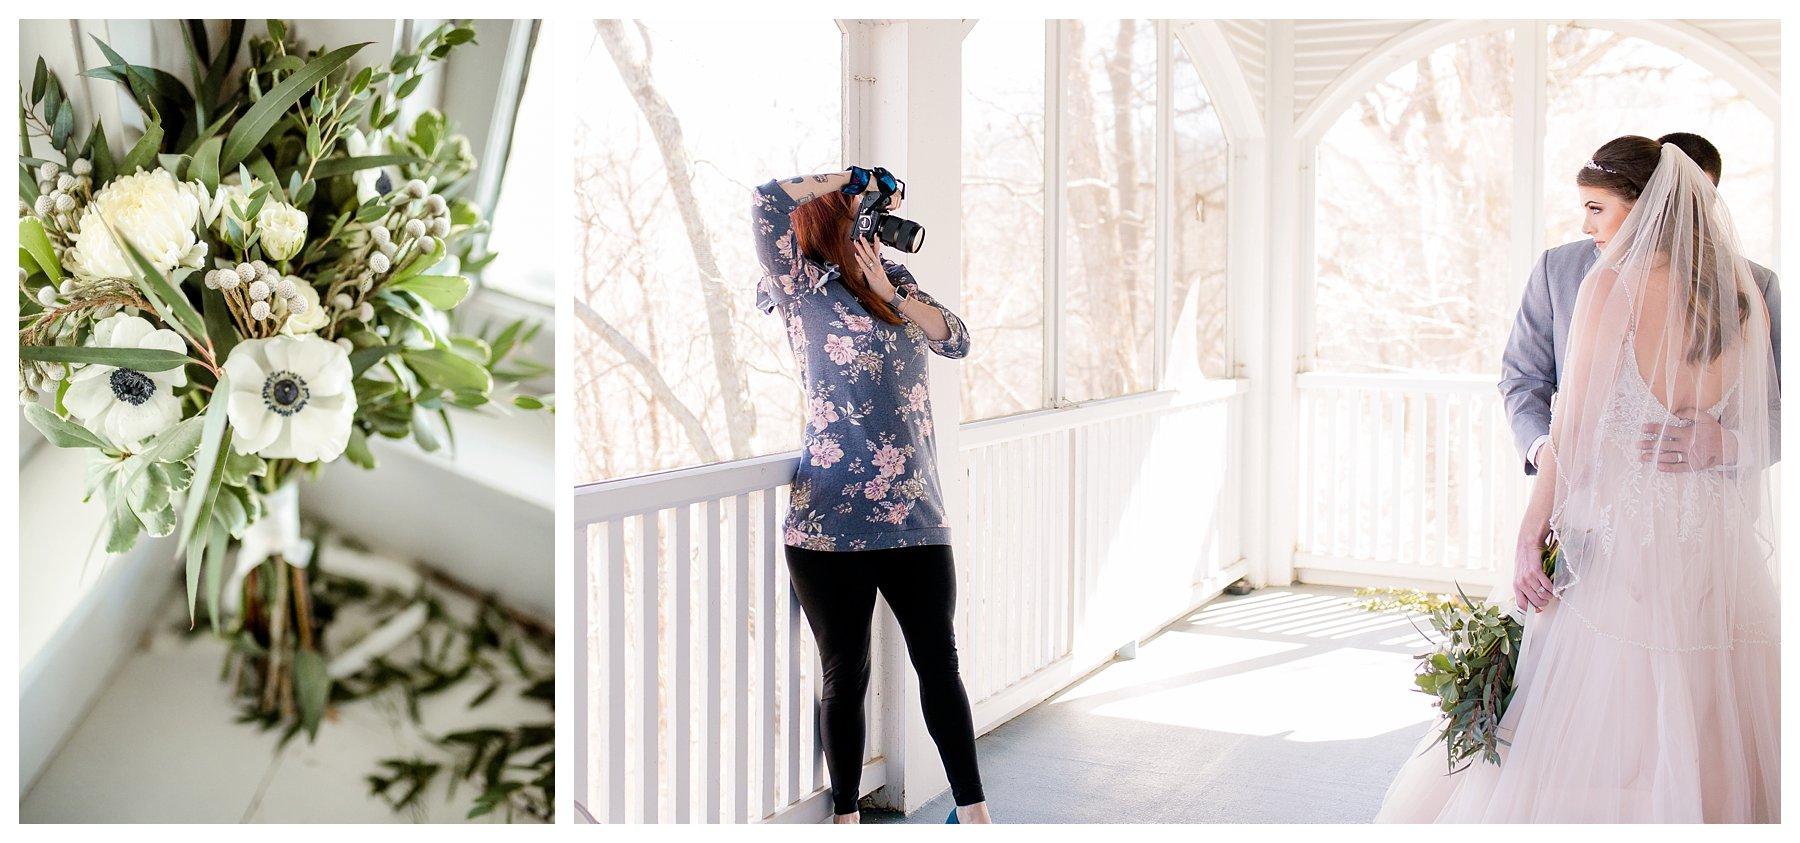 photographer_wedding_saint_louis_Kansas_City_Photography_Videography_workshop_training_styled_engagement_Lake_Ozark_KC_MO_STL_Rolla_Hermann_Saint_James_0391.jpg